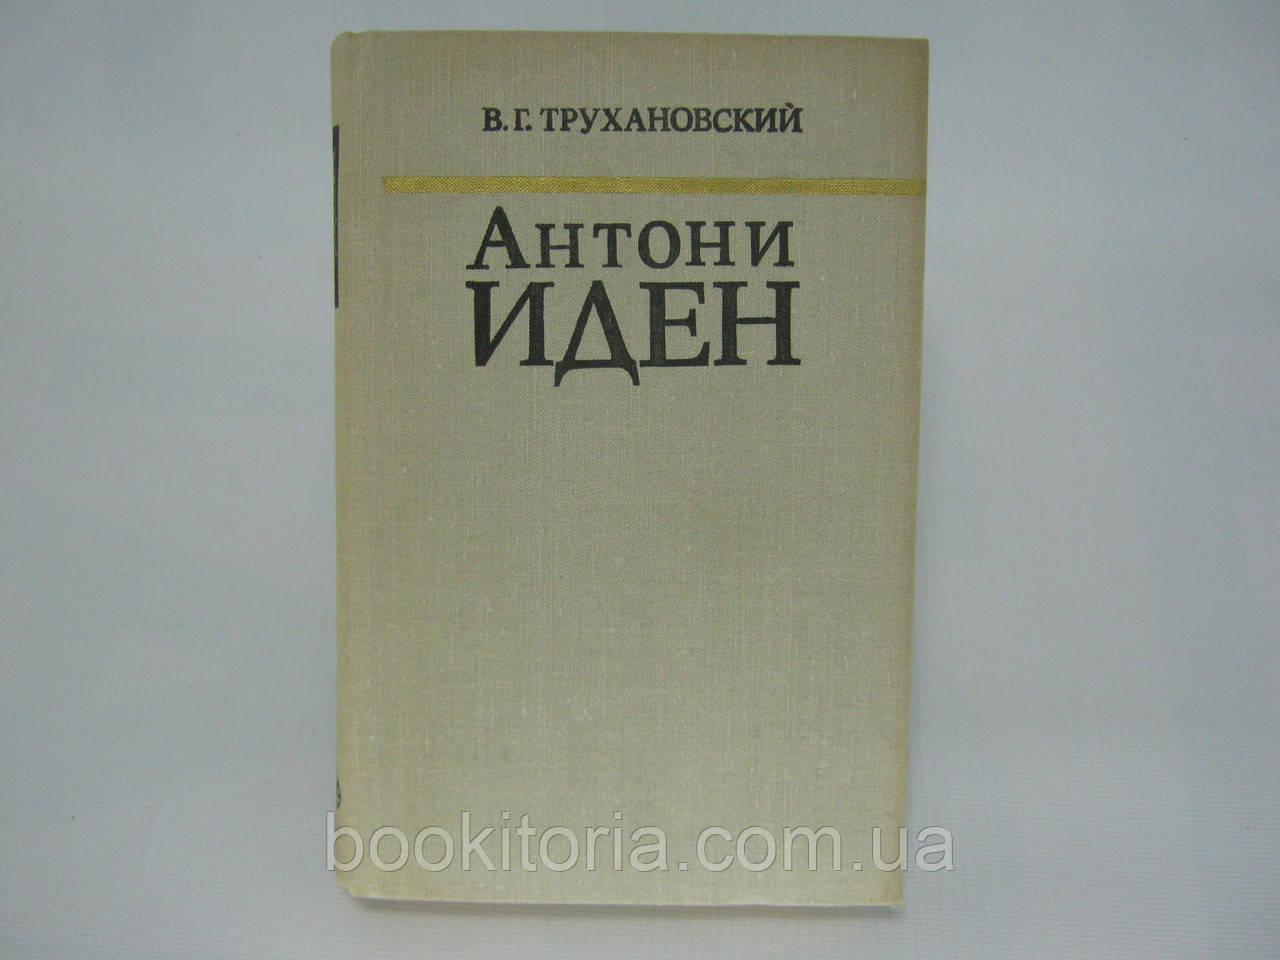 Трухановский В.Г. Антони Иден (б/у).